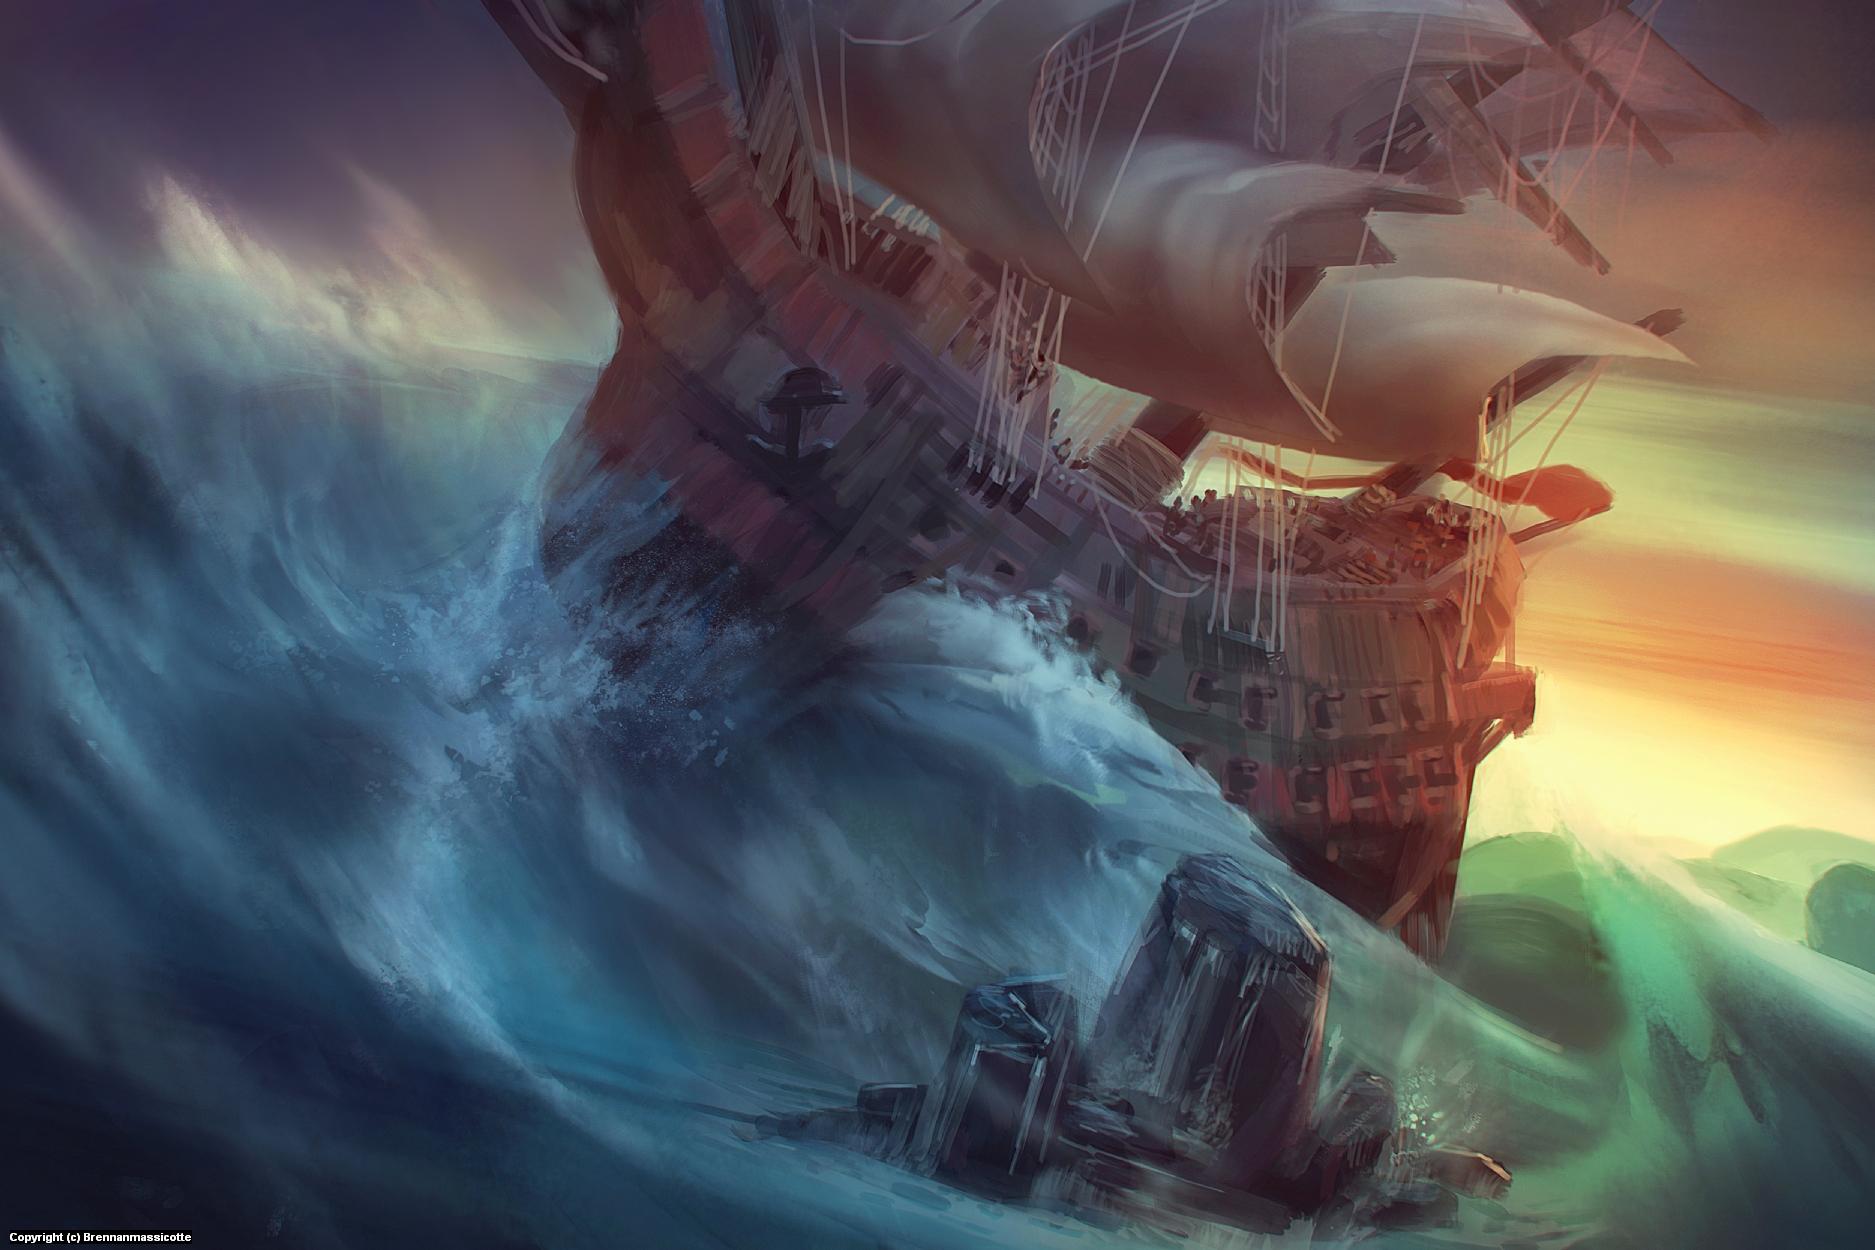 Stormy Seas Artwork by Brennan Massicotte